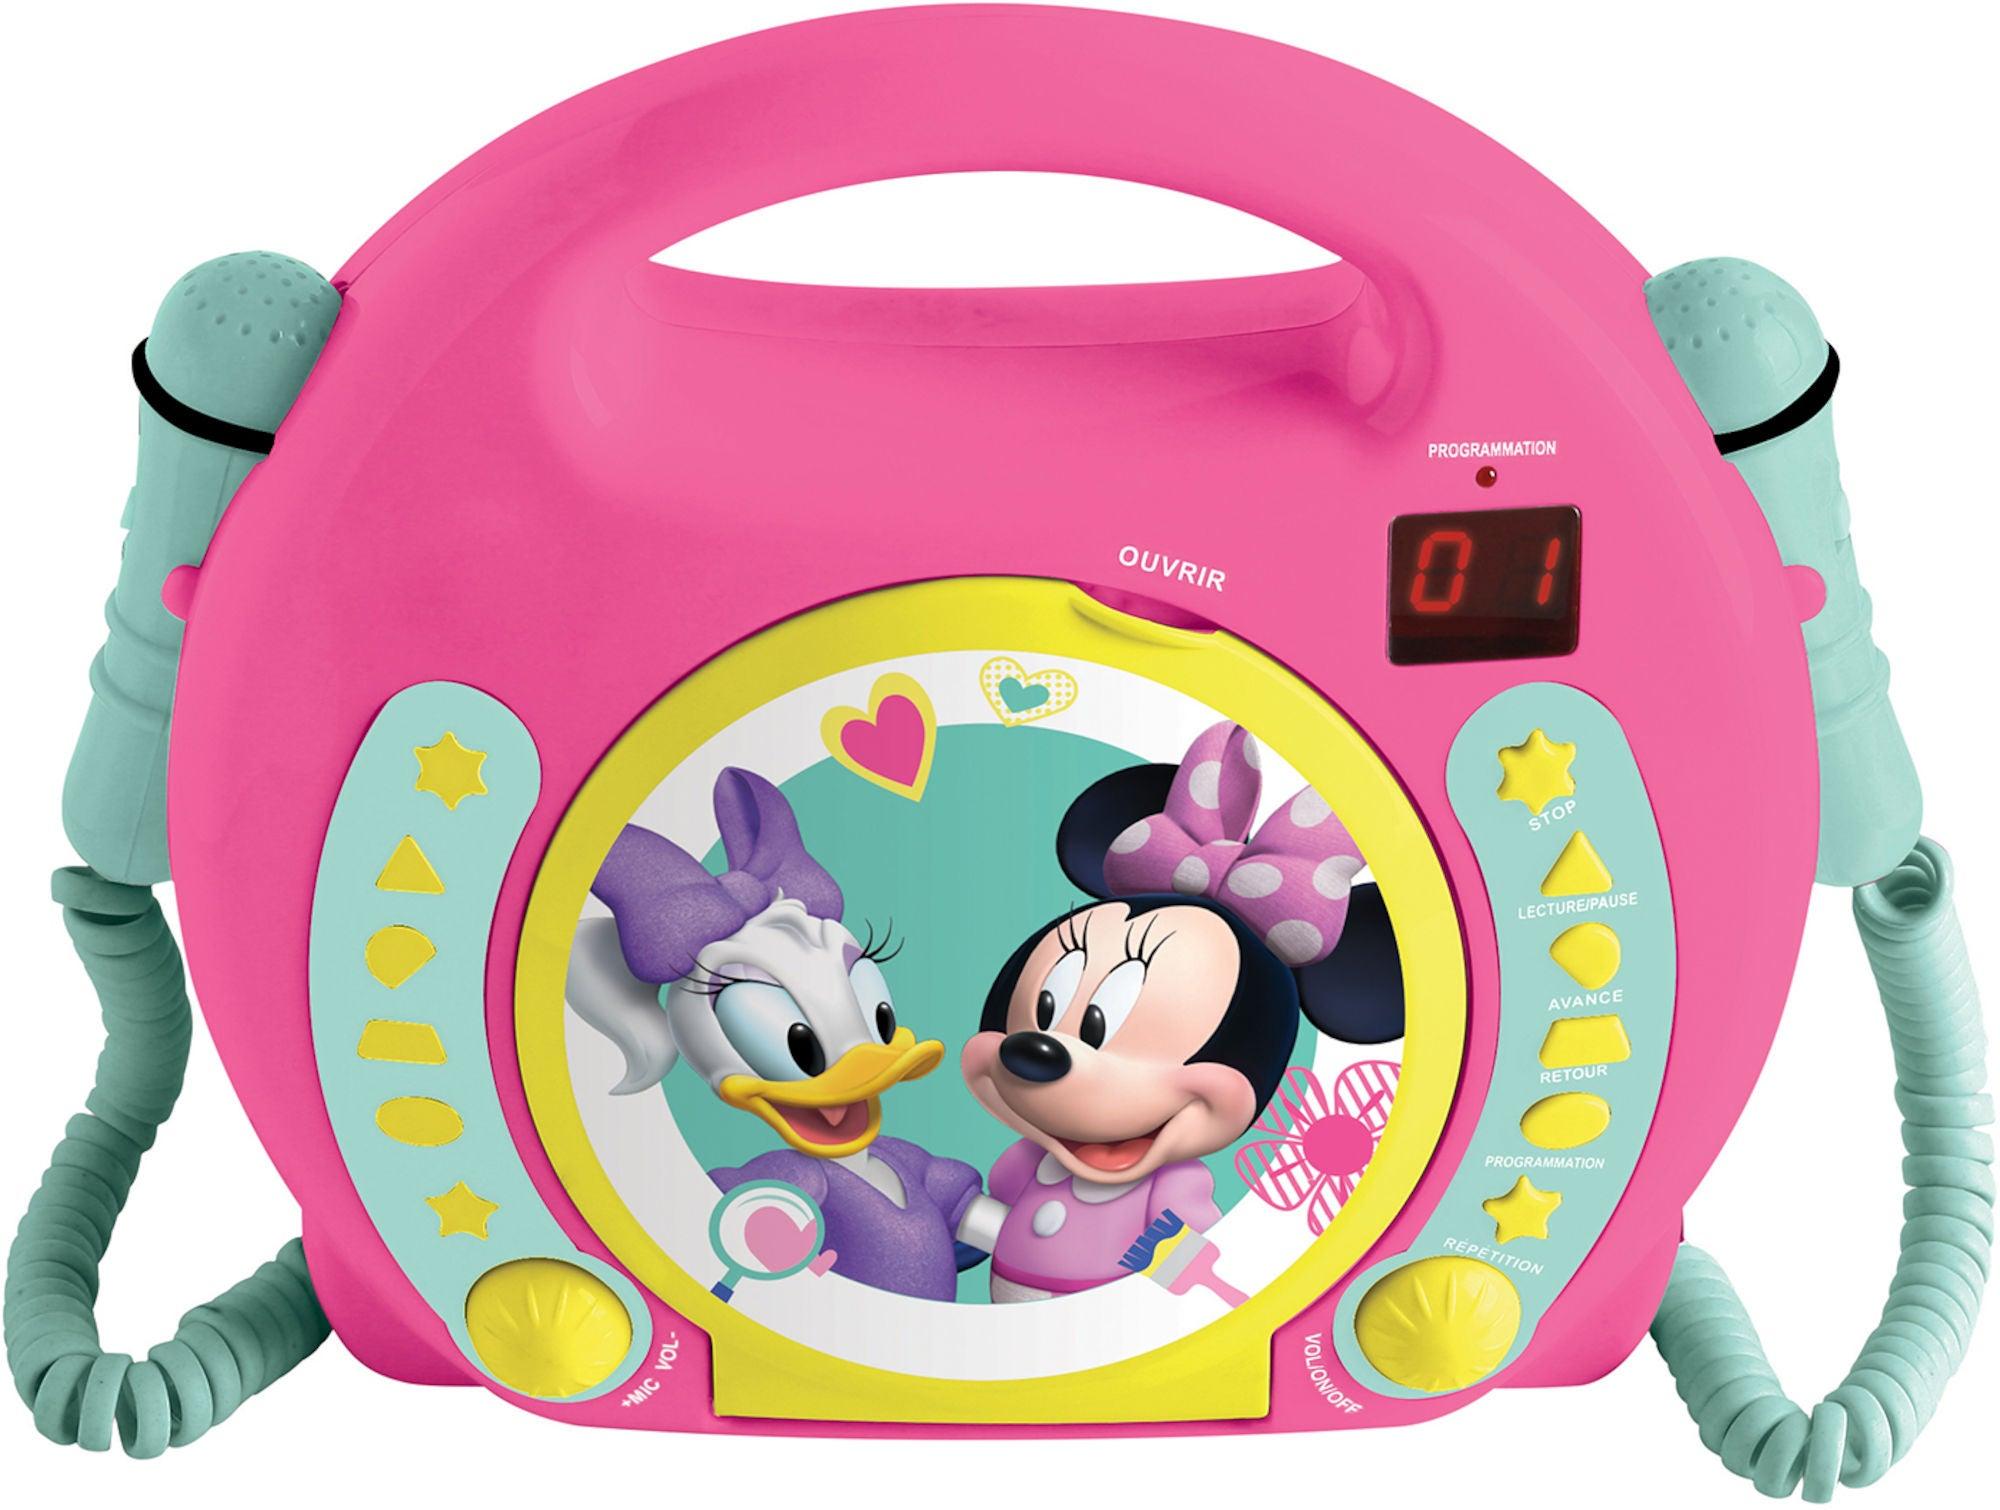 Disney Minni Mus CD-spiller med Mikrofon